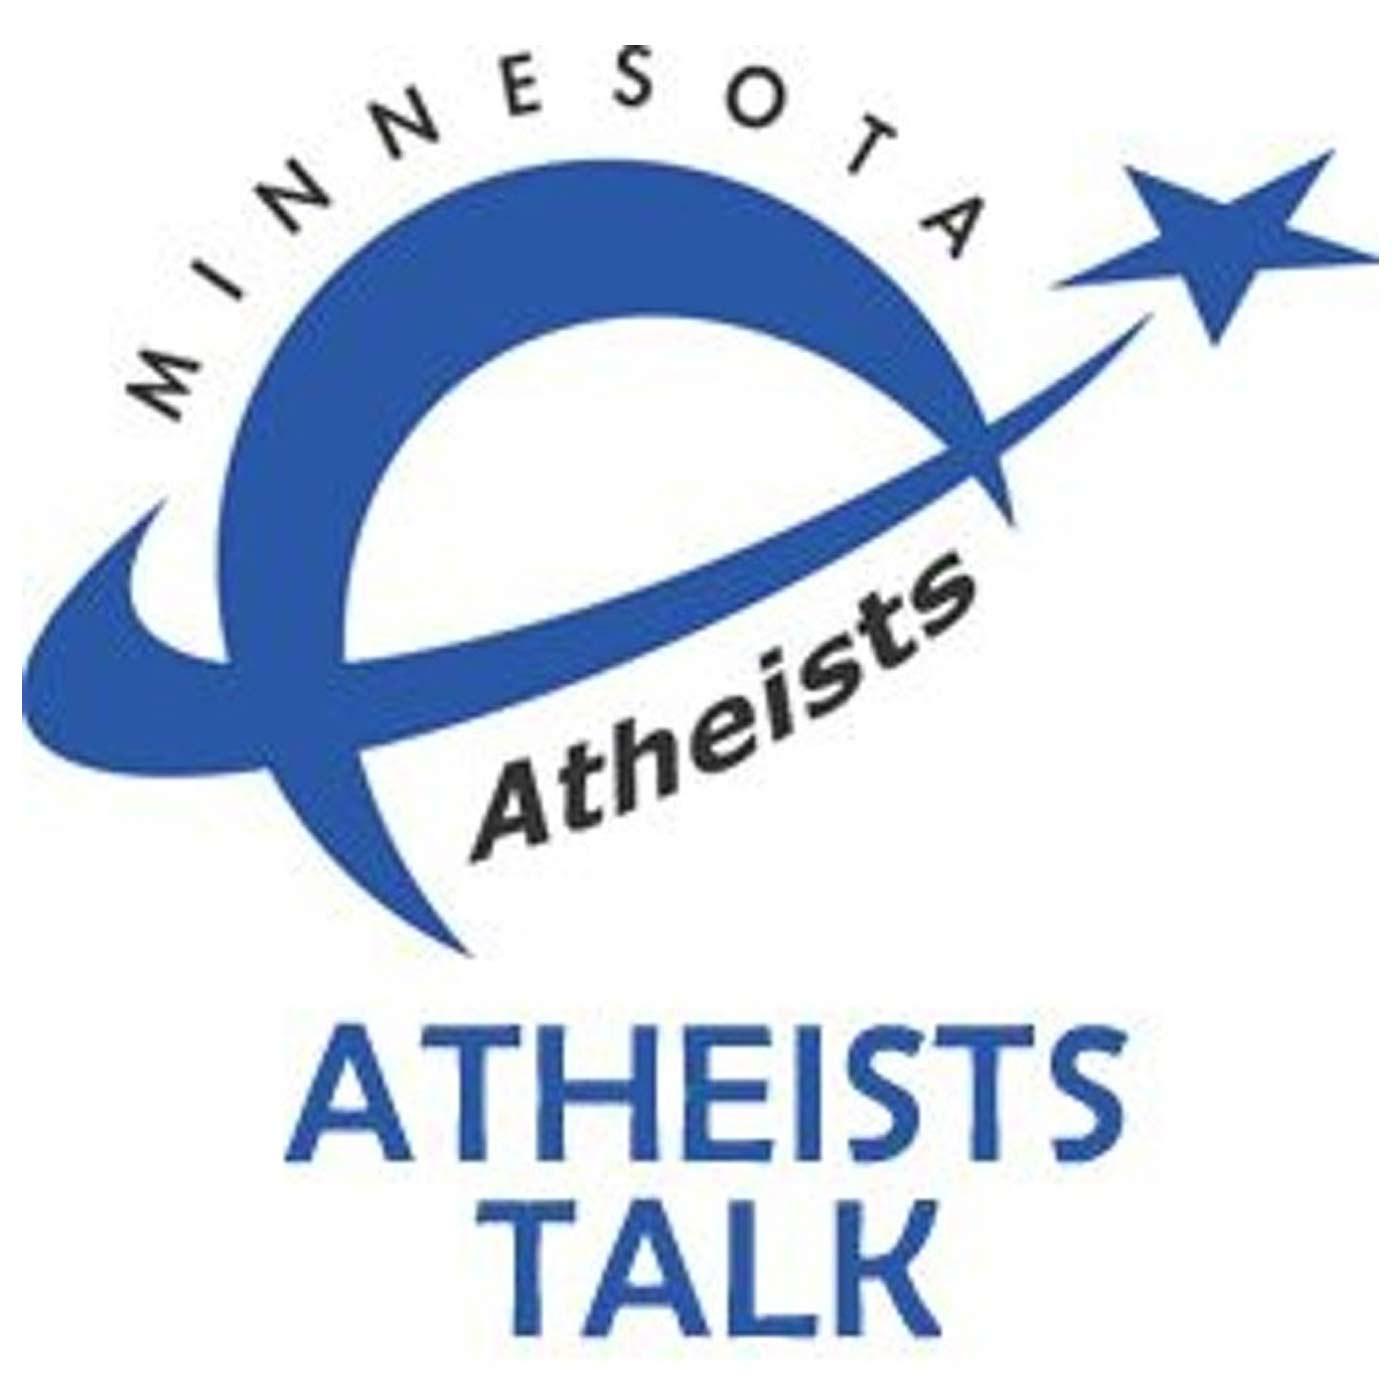 Atheists Talk - AM950 The Progressive Voice of Minnesota